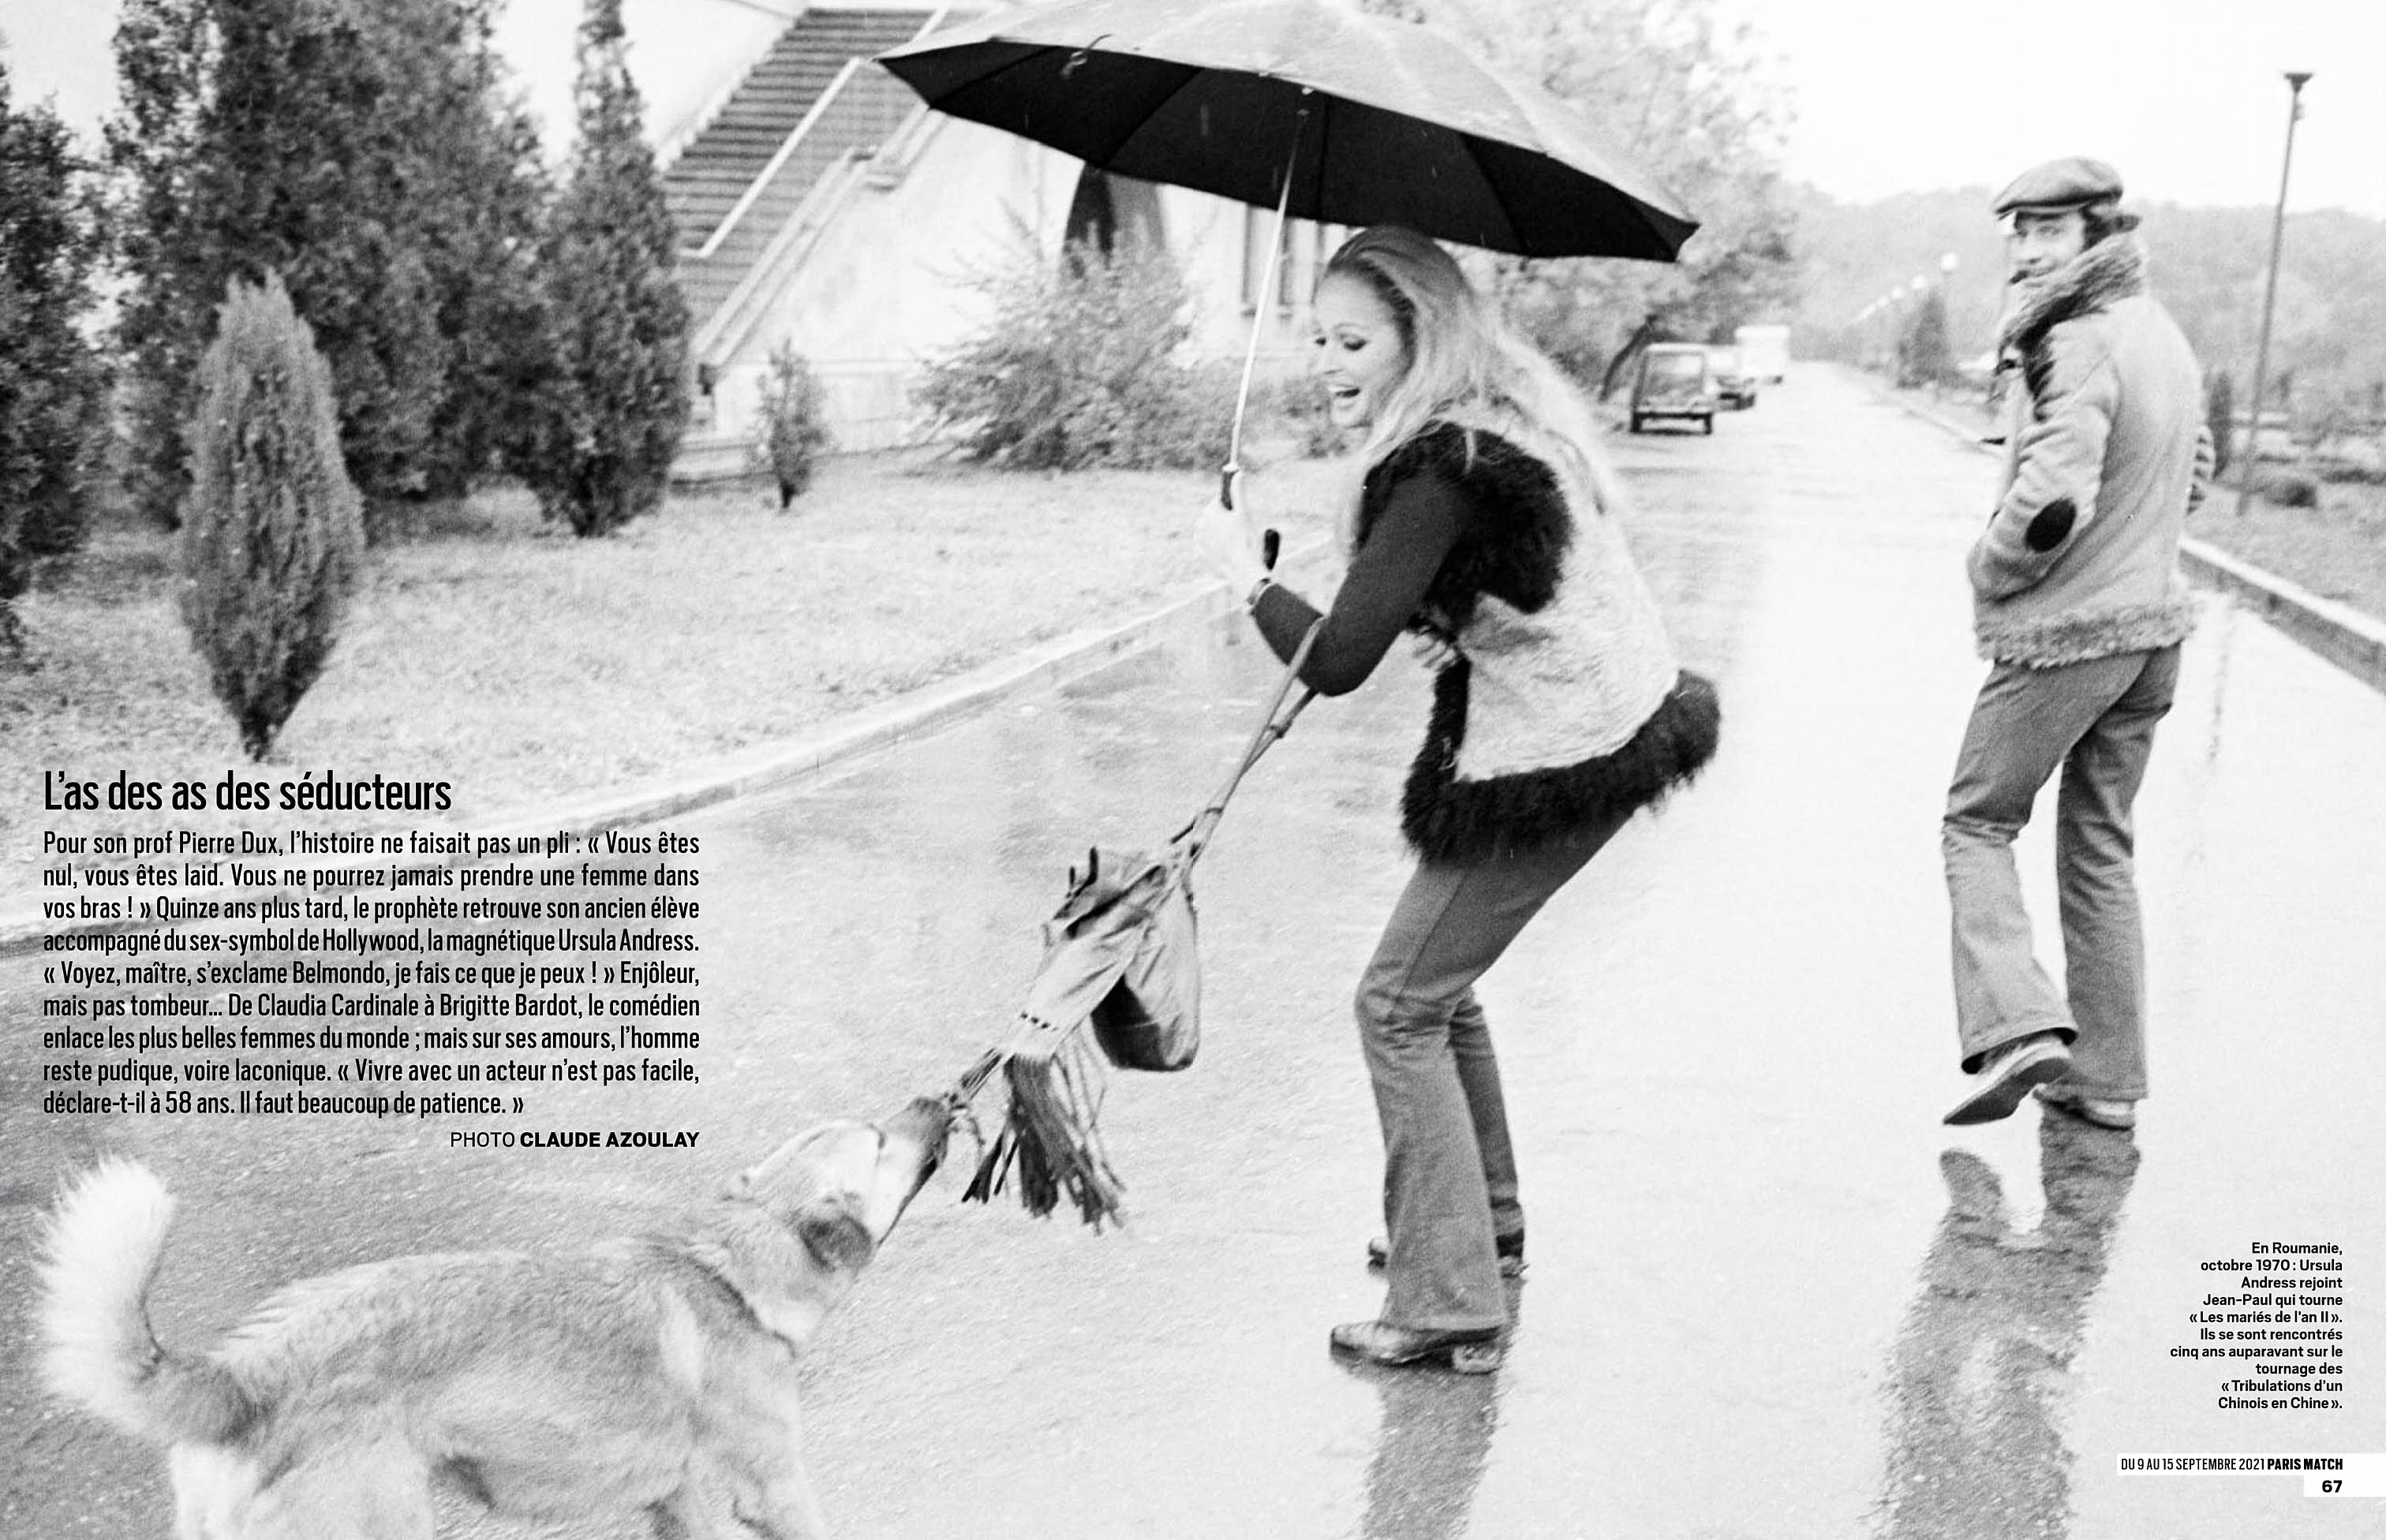 Paris Match 210909 Belmondo 10.jpg